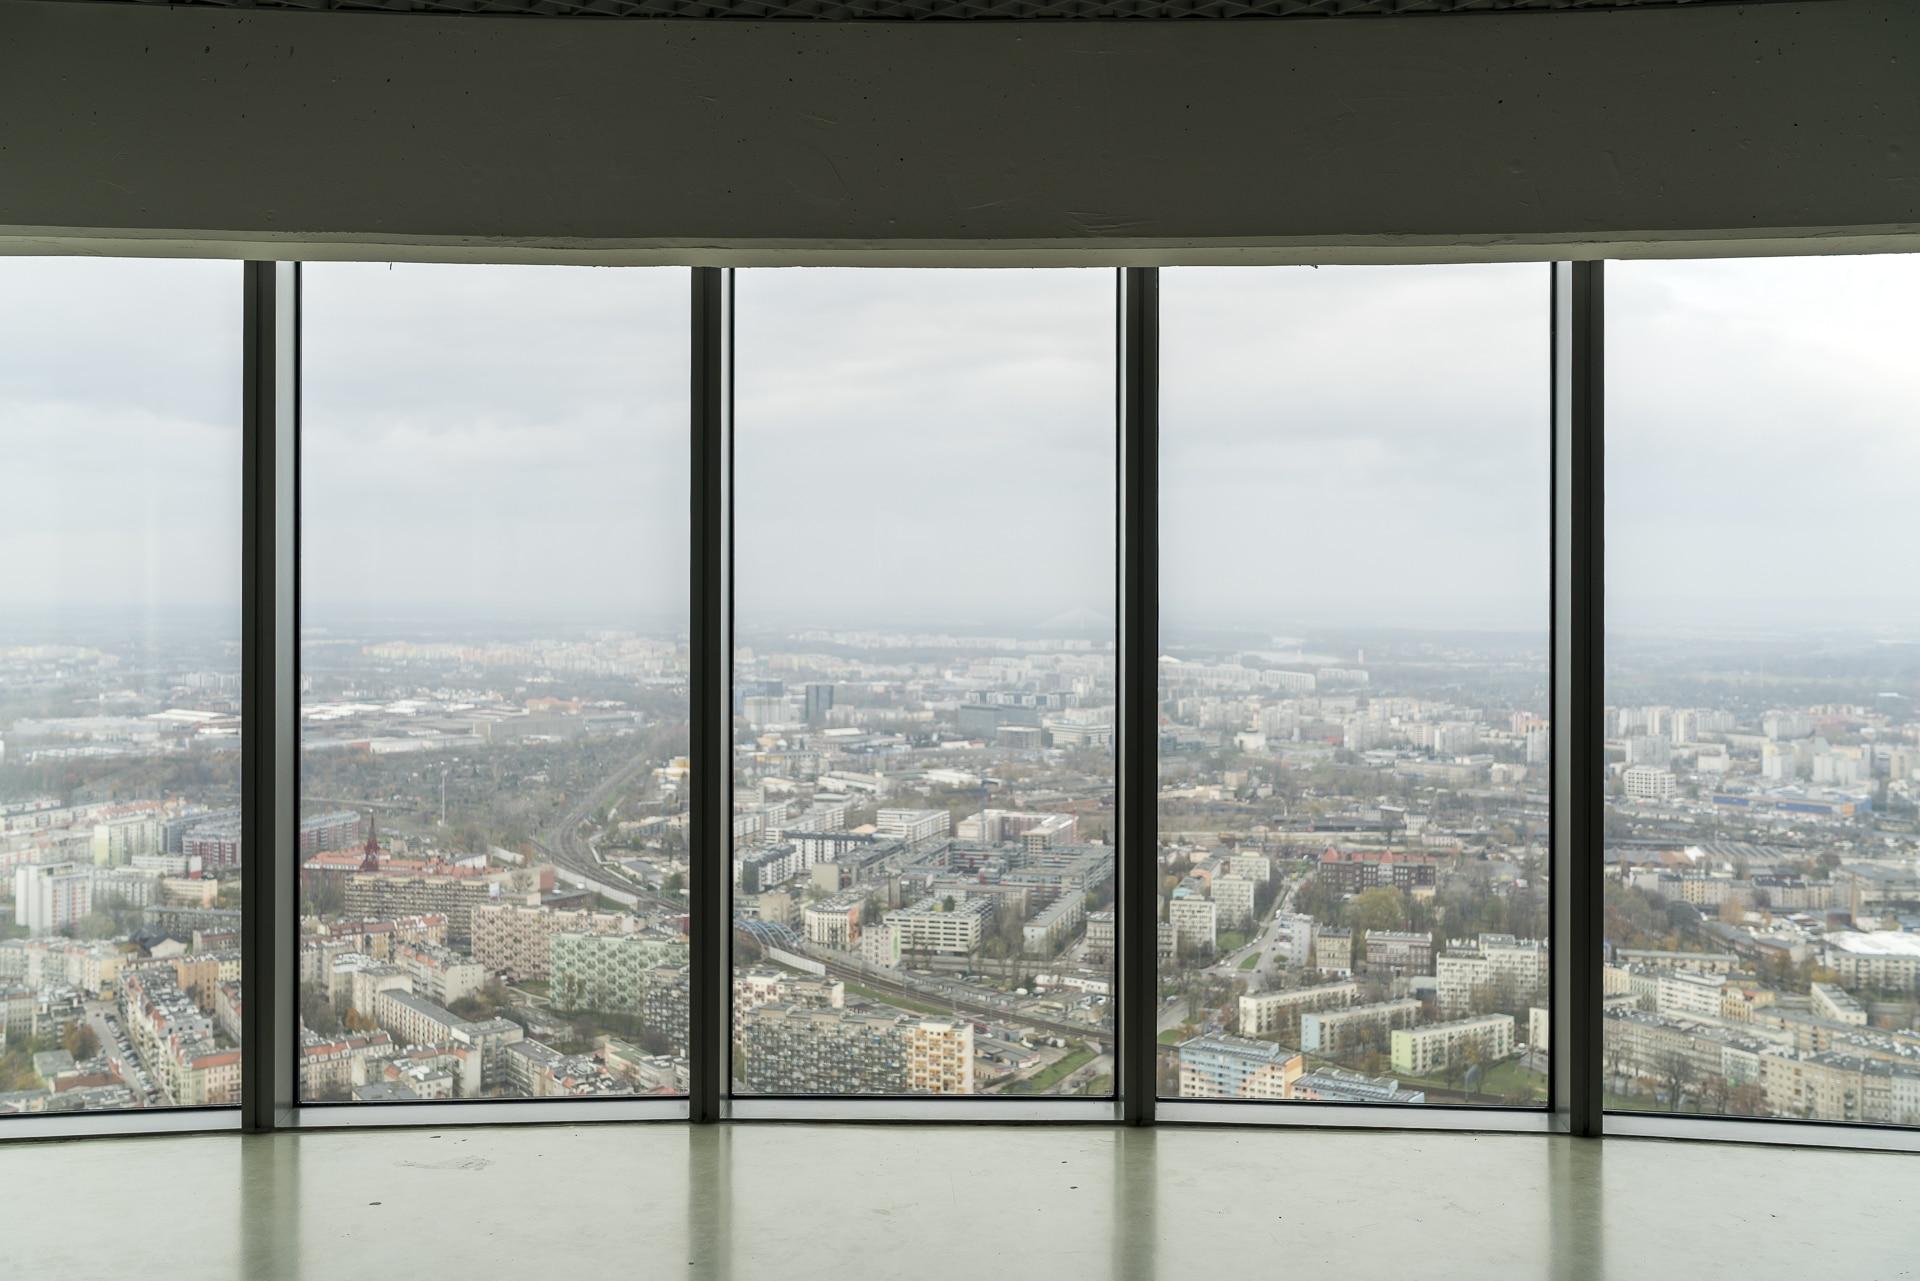 Aussicht Sky Tower Wroclaw